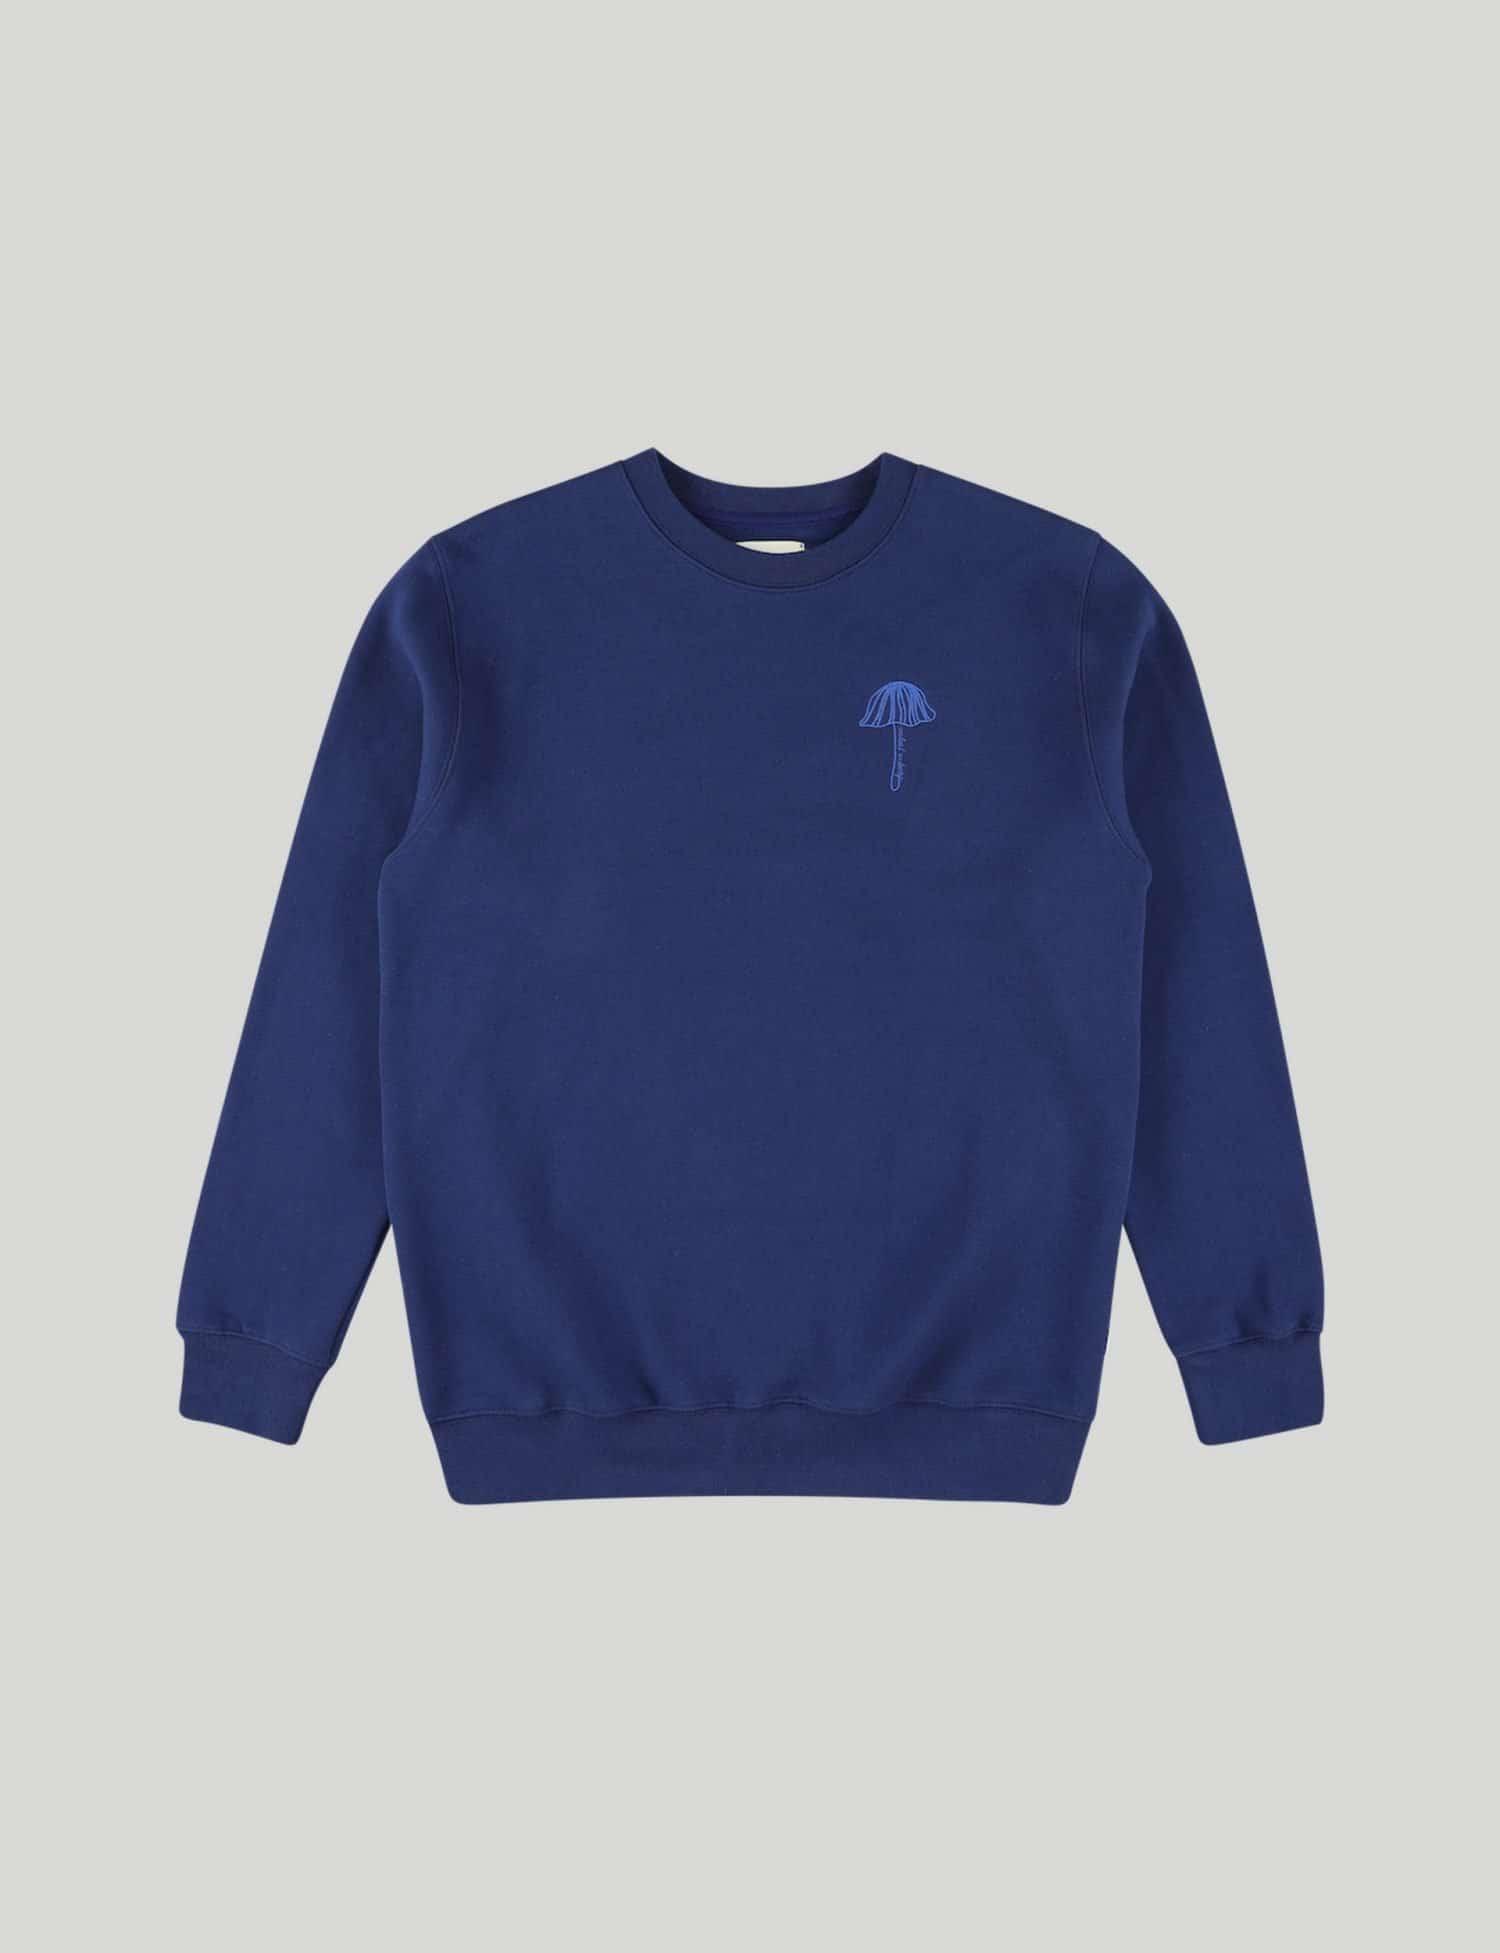 Castart - Shimeji Sweater - Blue